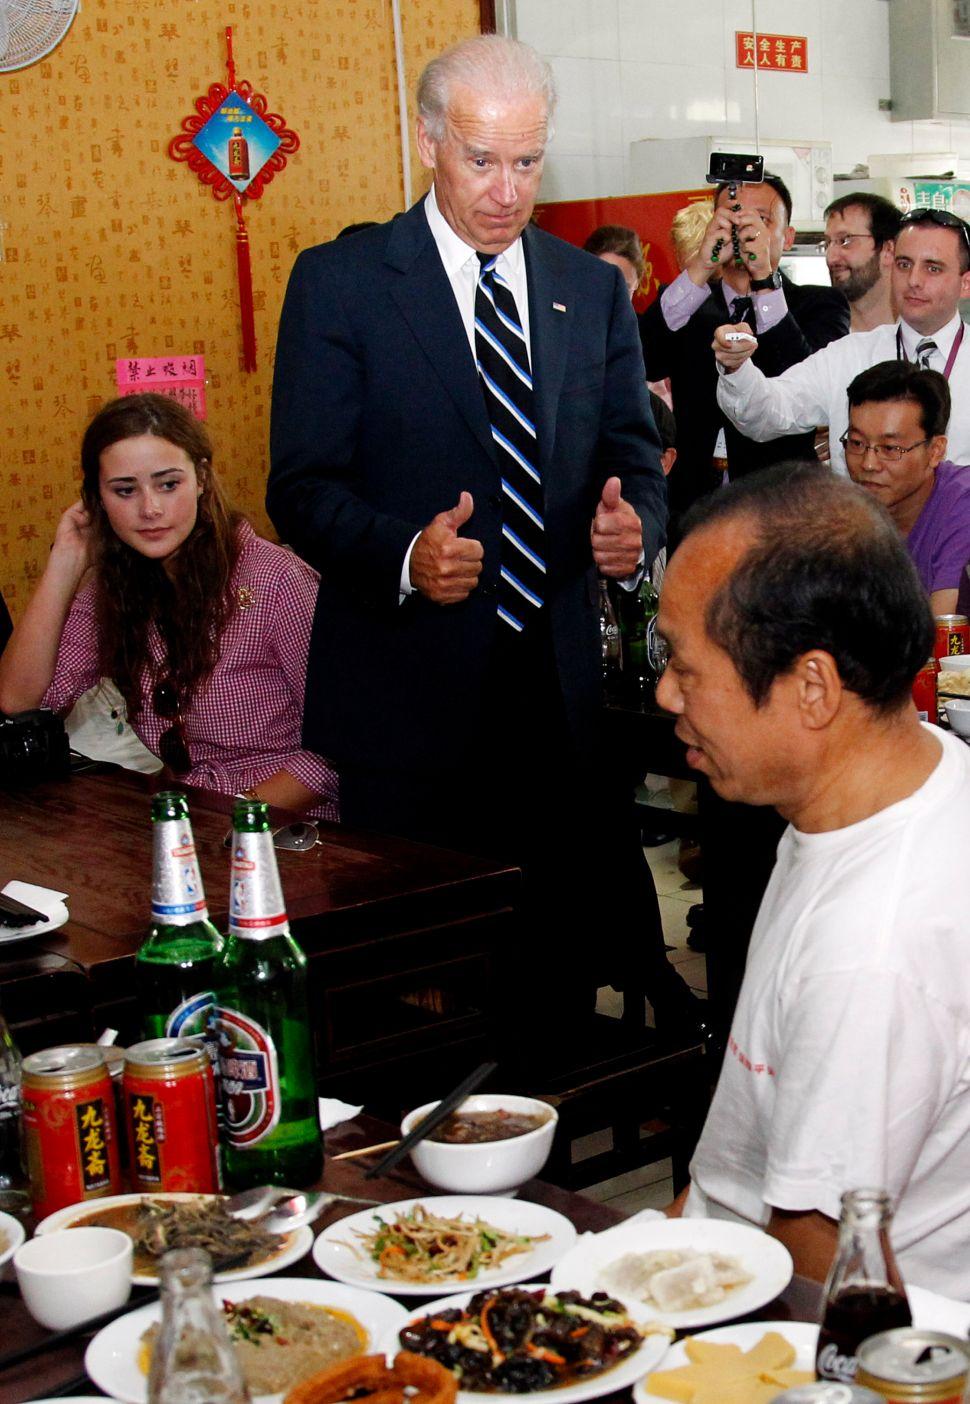 Romney Spokesman Crashes Joe Biden's Spaghetti Dinner